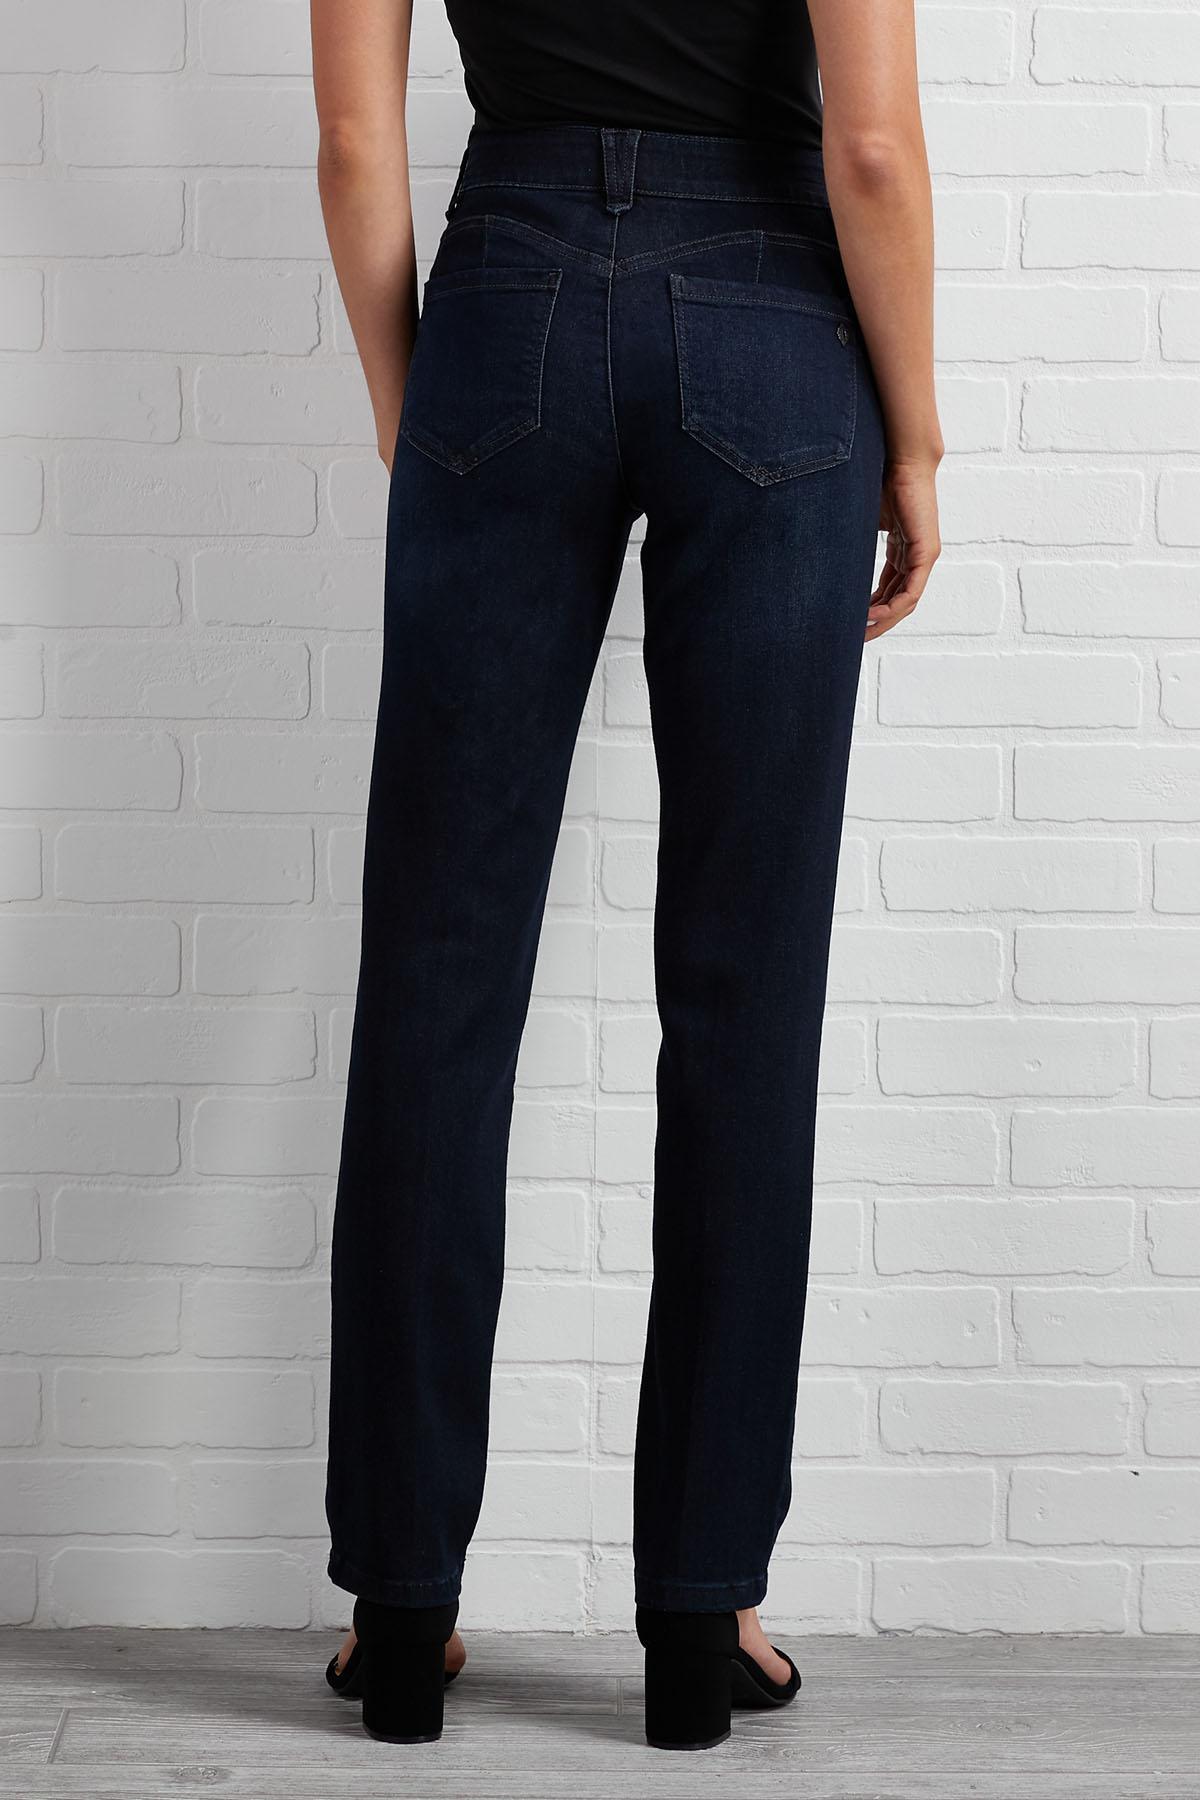 Always Classic Straight Leg Jeans